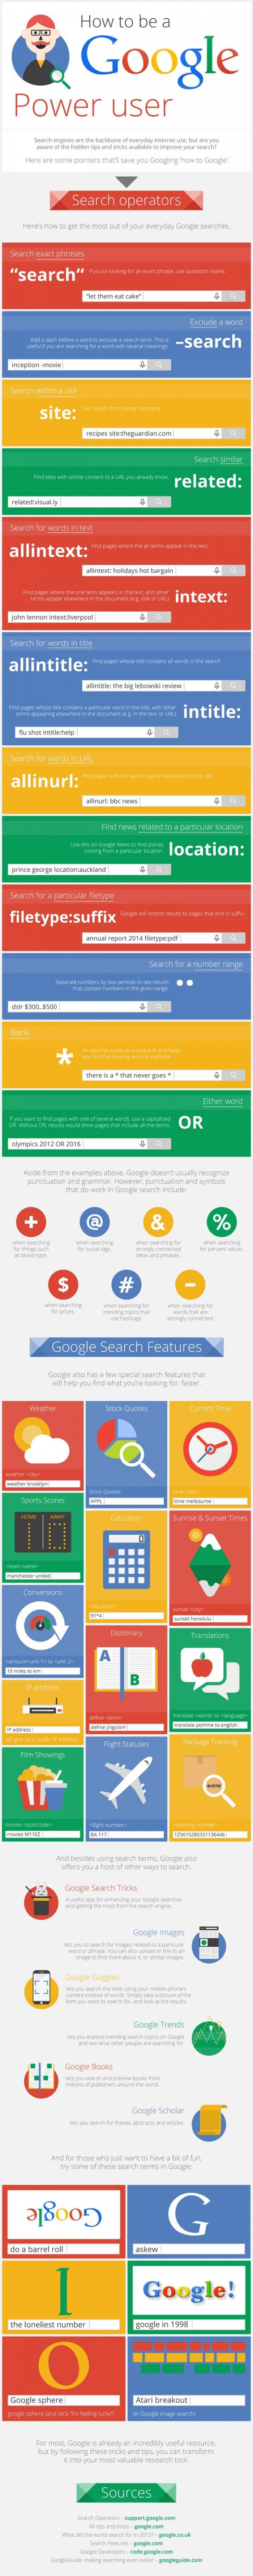 Be a google power user